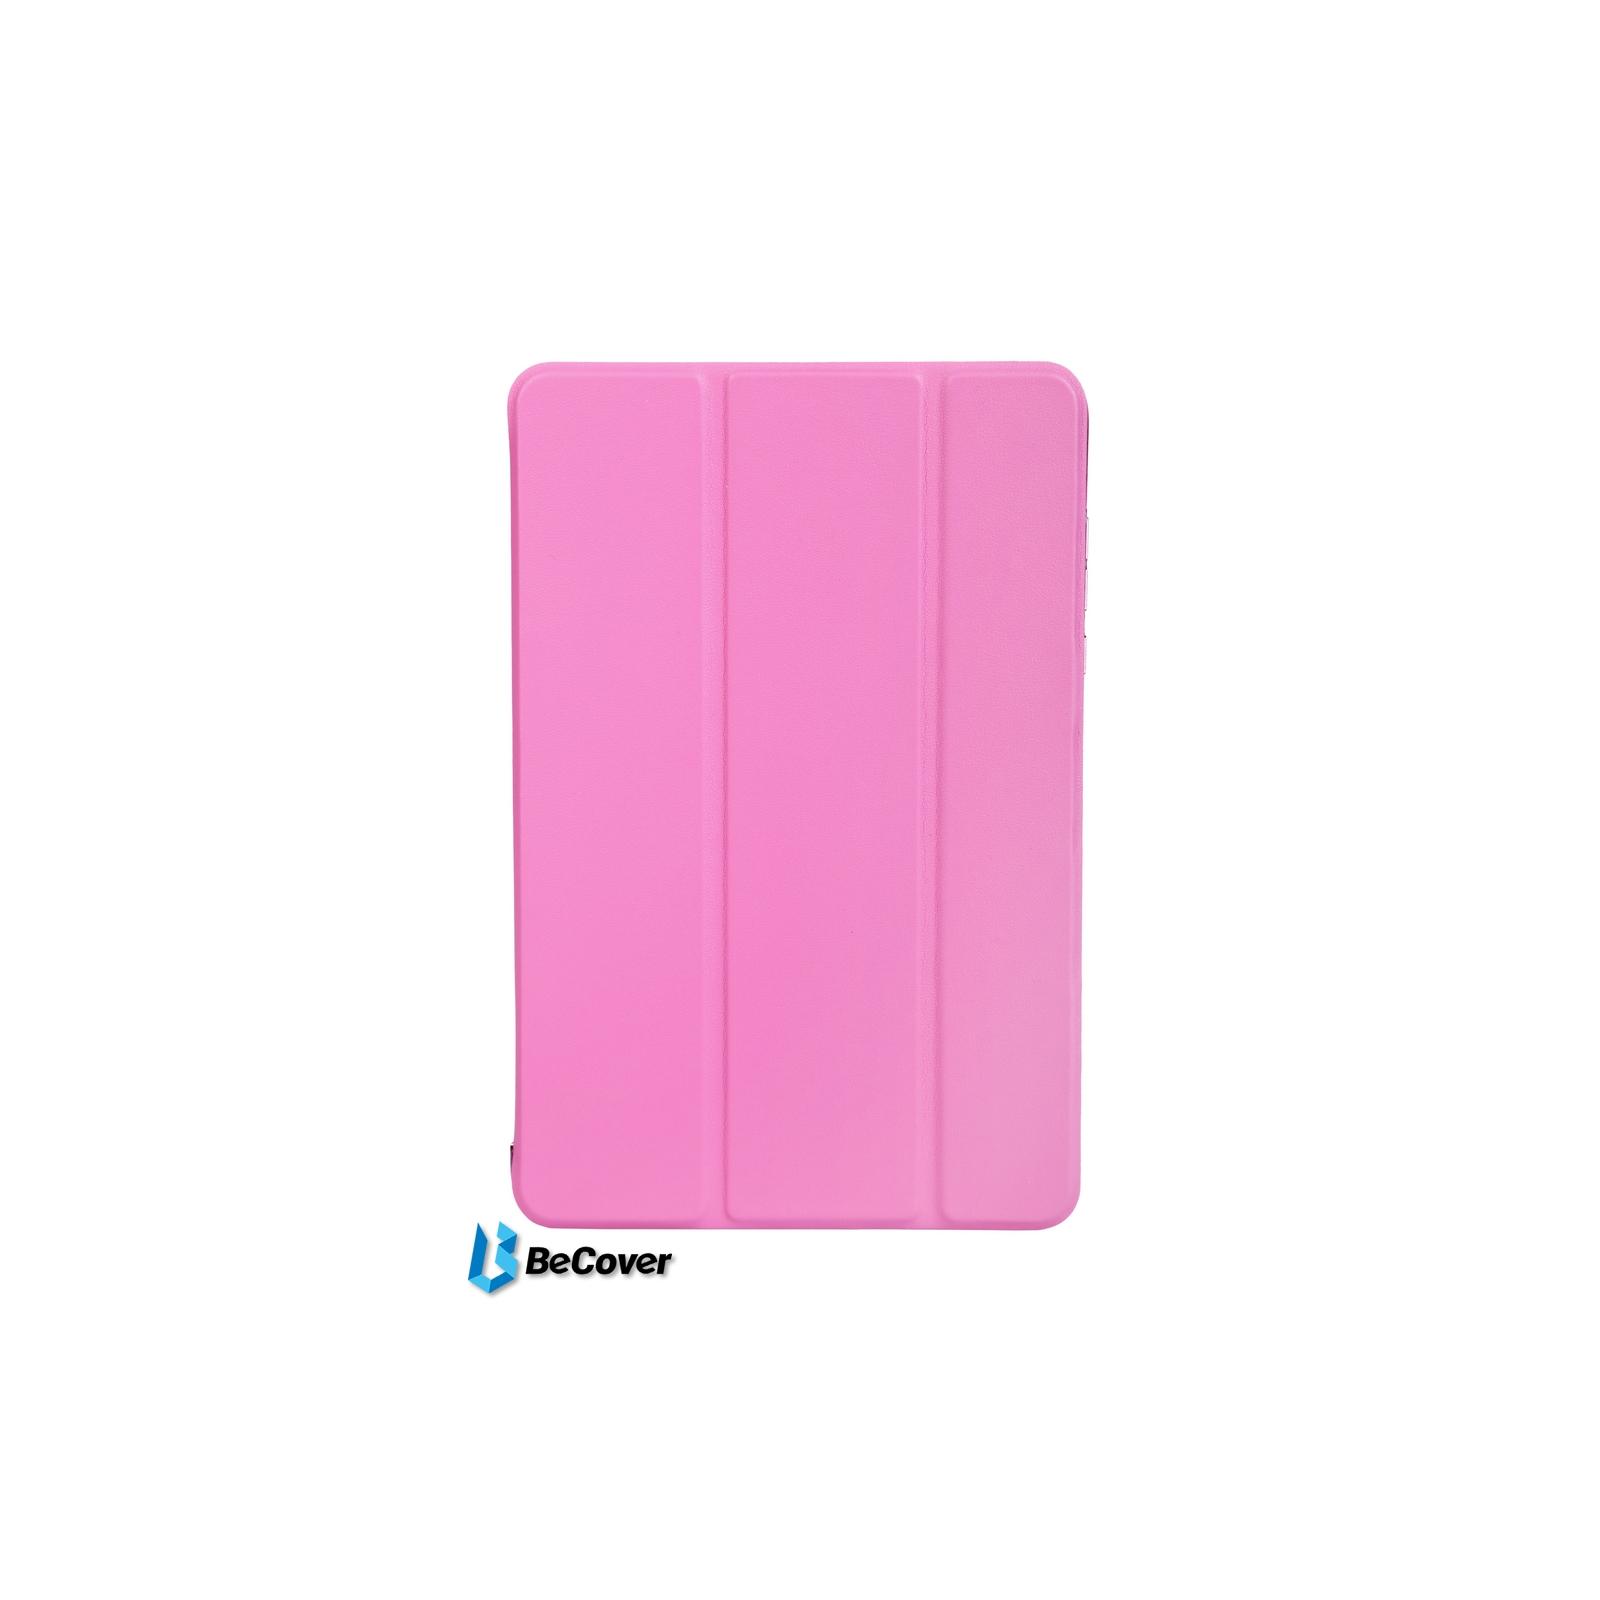 Чехол для планшета BeCover Pencil для Apple iPad 10.2 2019/2020 Red (704153)